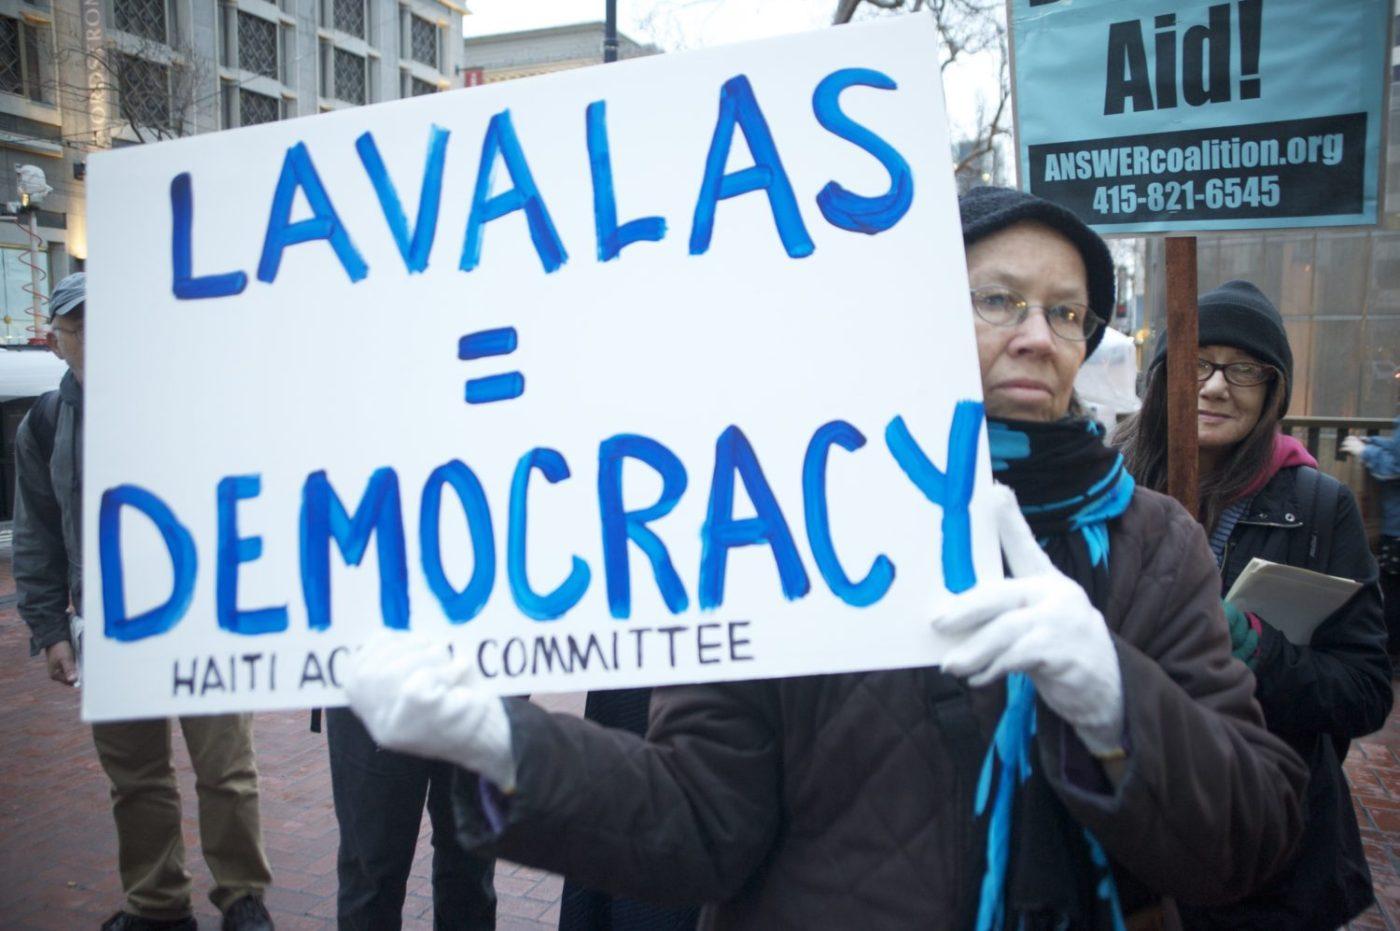 Haiti-earthquake-SF-rally-Lavalas-Democracy-012510-by-Kamau-1400x931, Alone we are weak, together we are strong, all together WE ARE LAVALAS: Lavalas statement on coronavirus, World News & Views